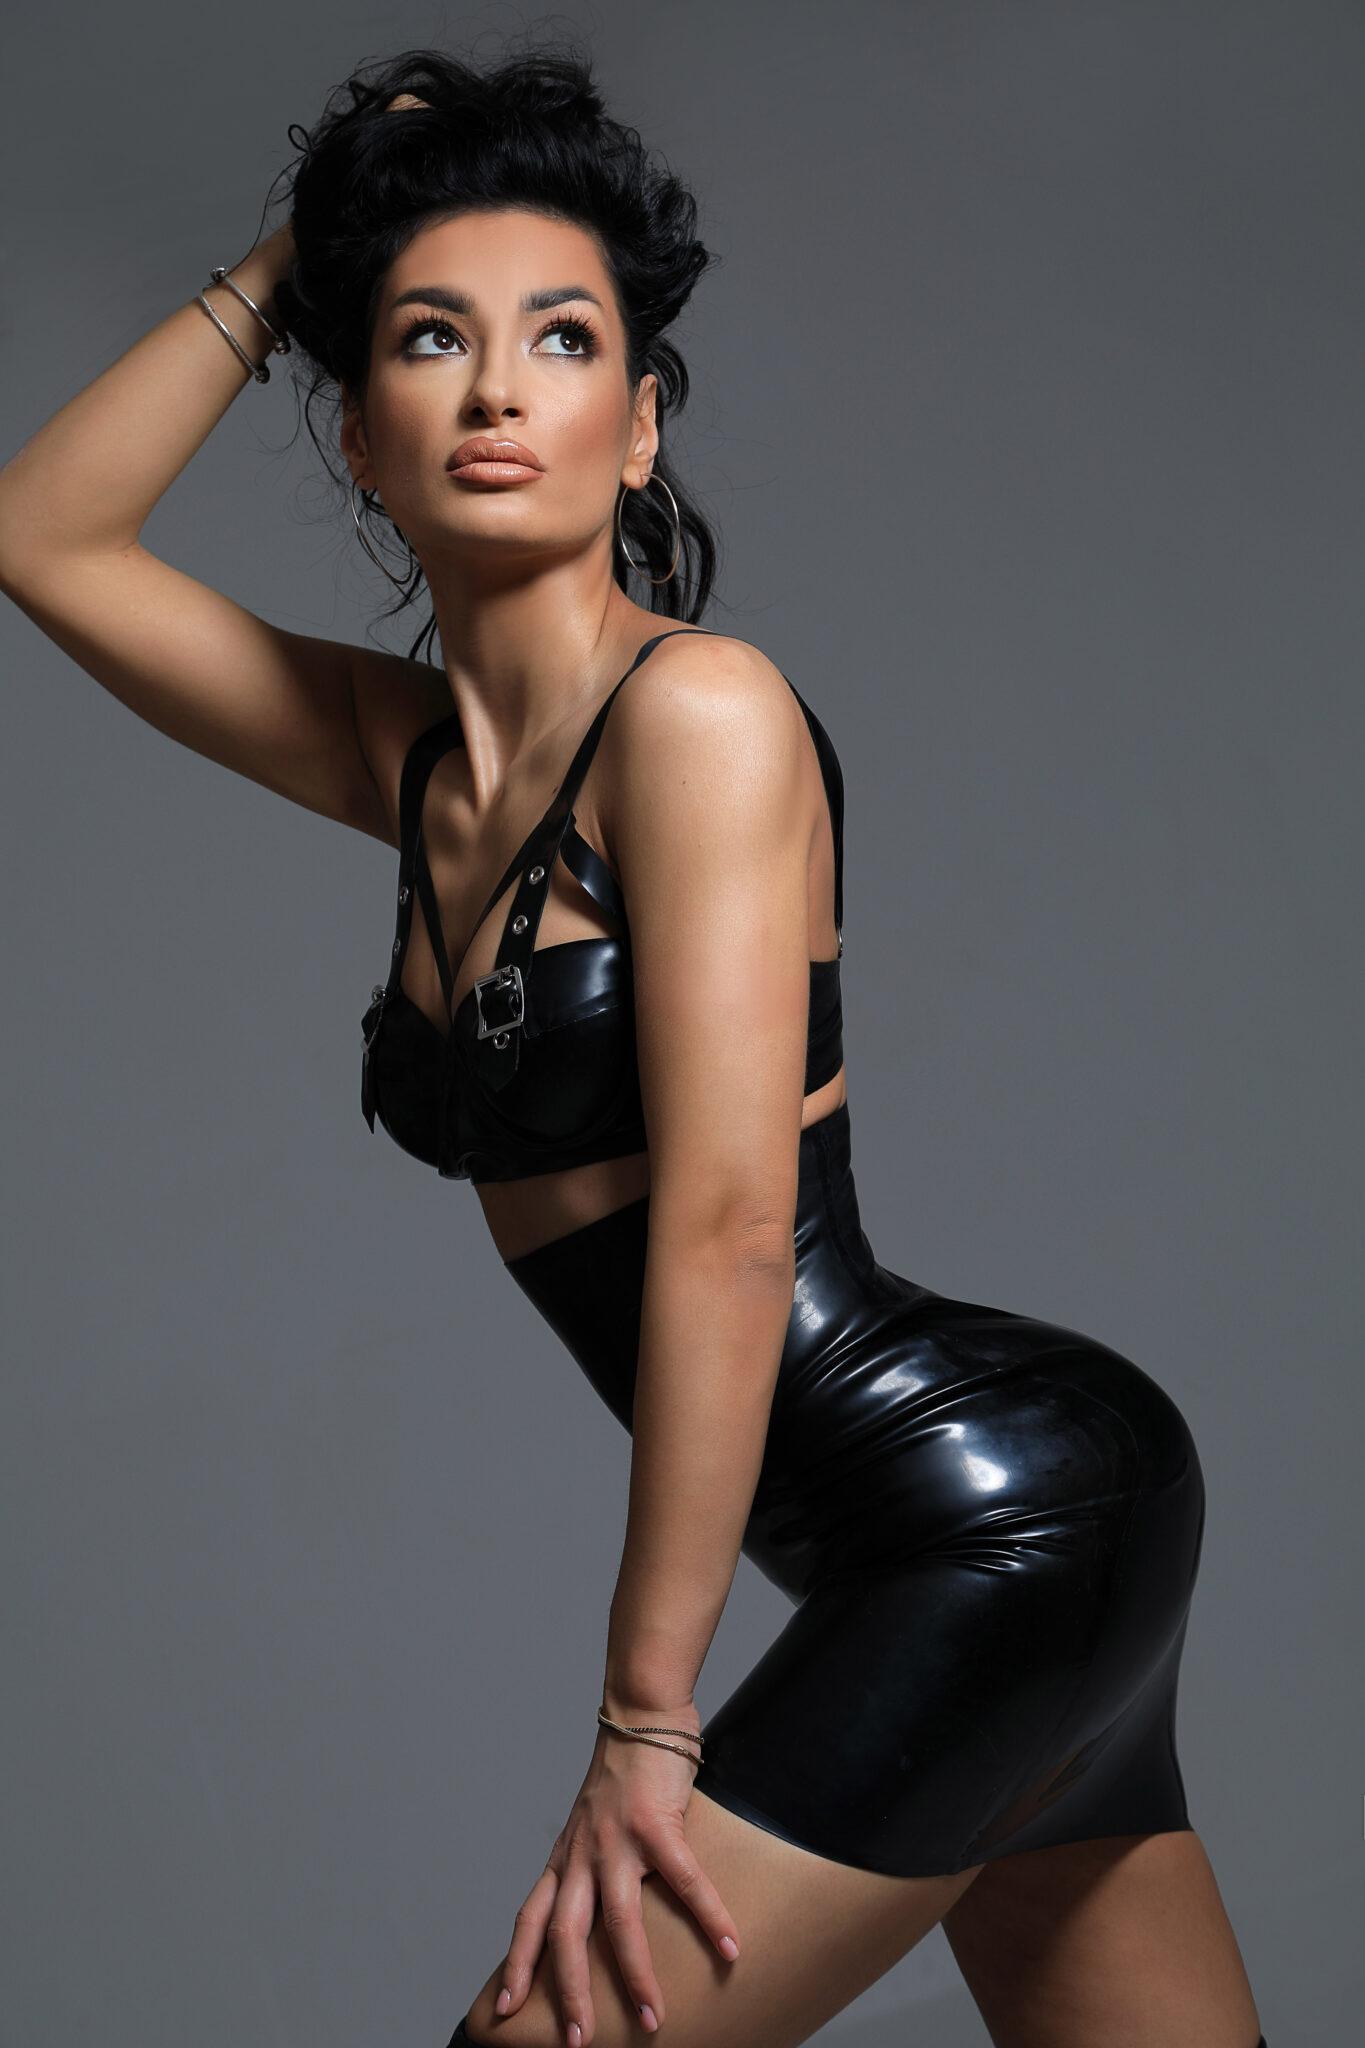 Afina - Prestige London Escorts - 24hr BDSM Party Mistress